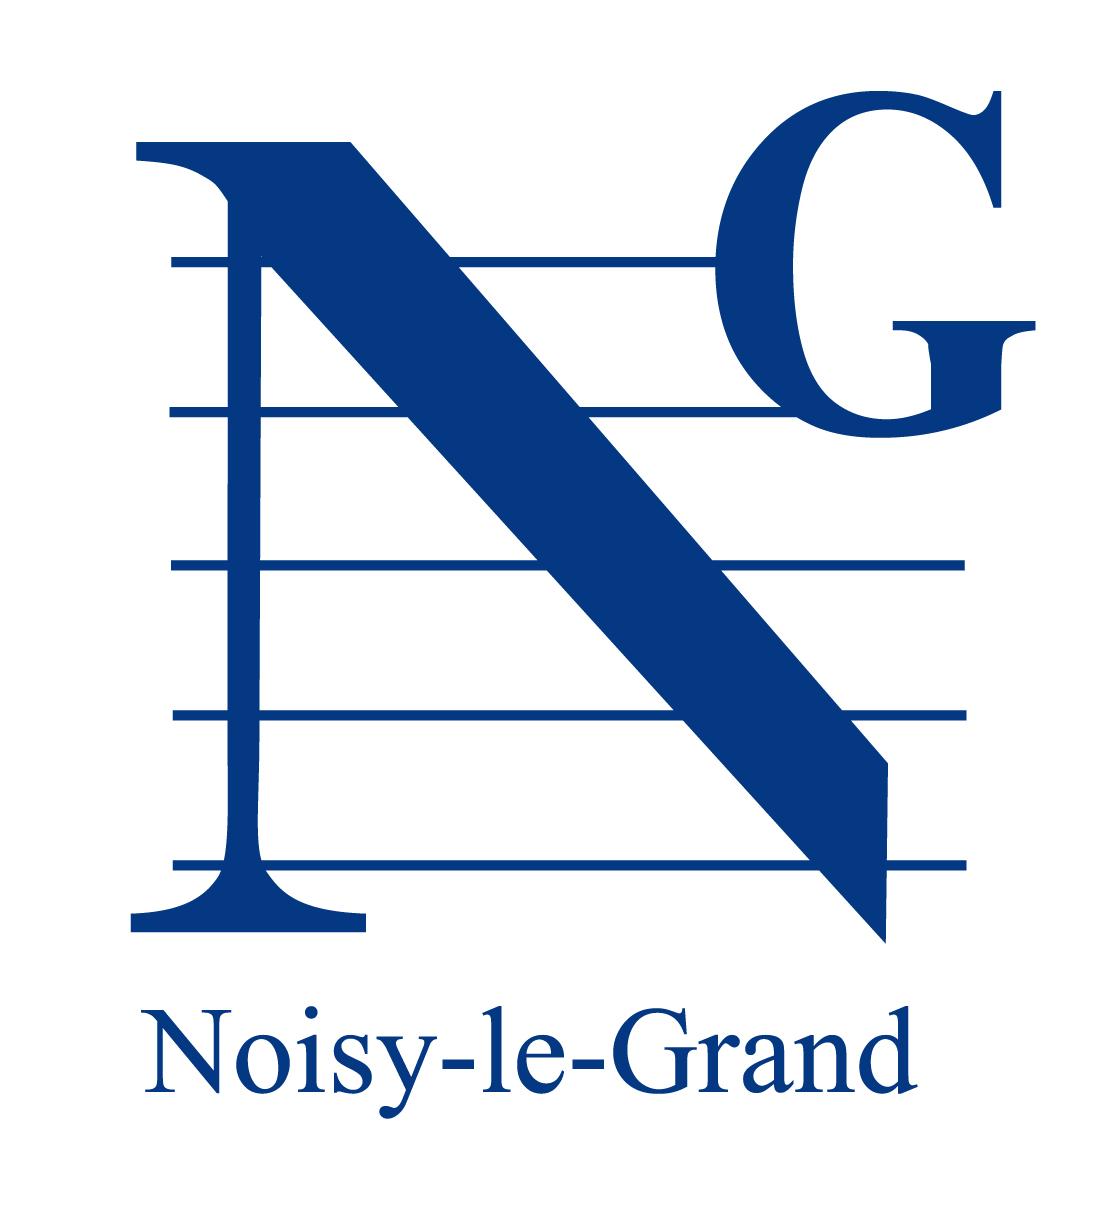 Plan de noisy le grand id es de for Noisy le grand garage